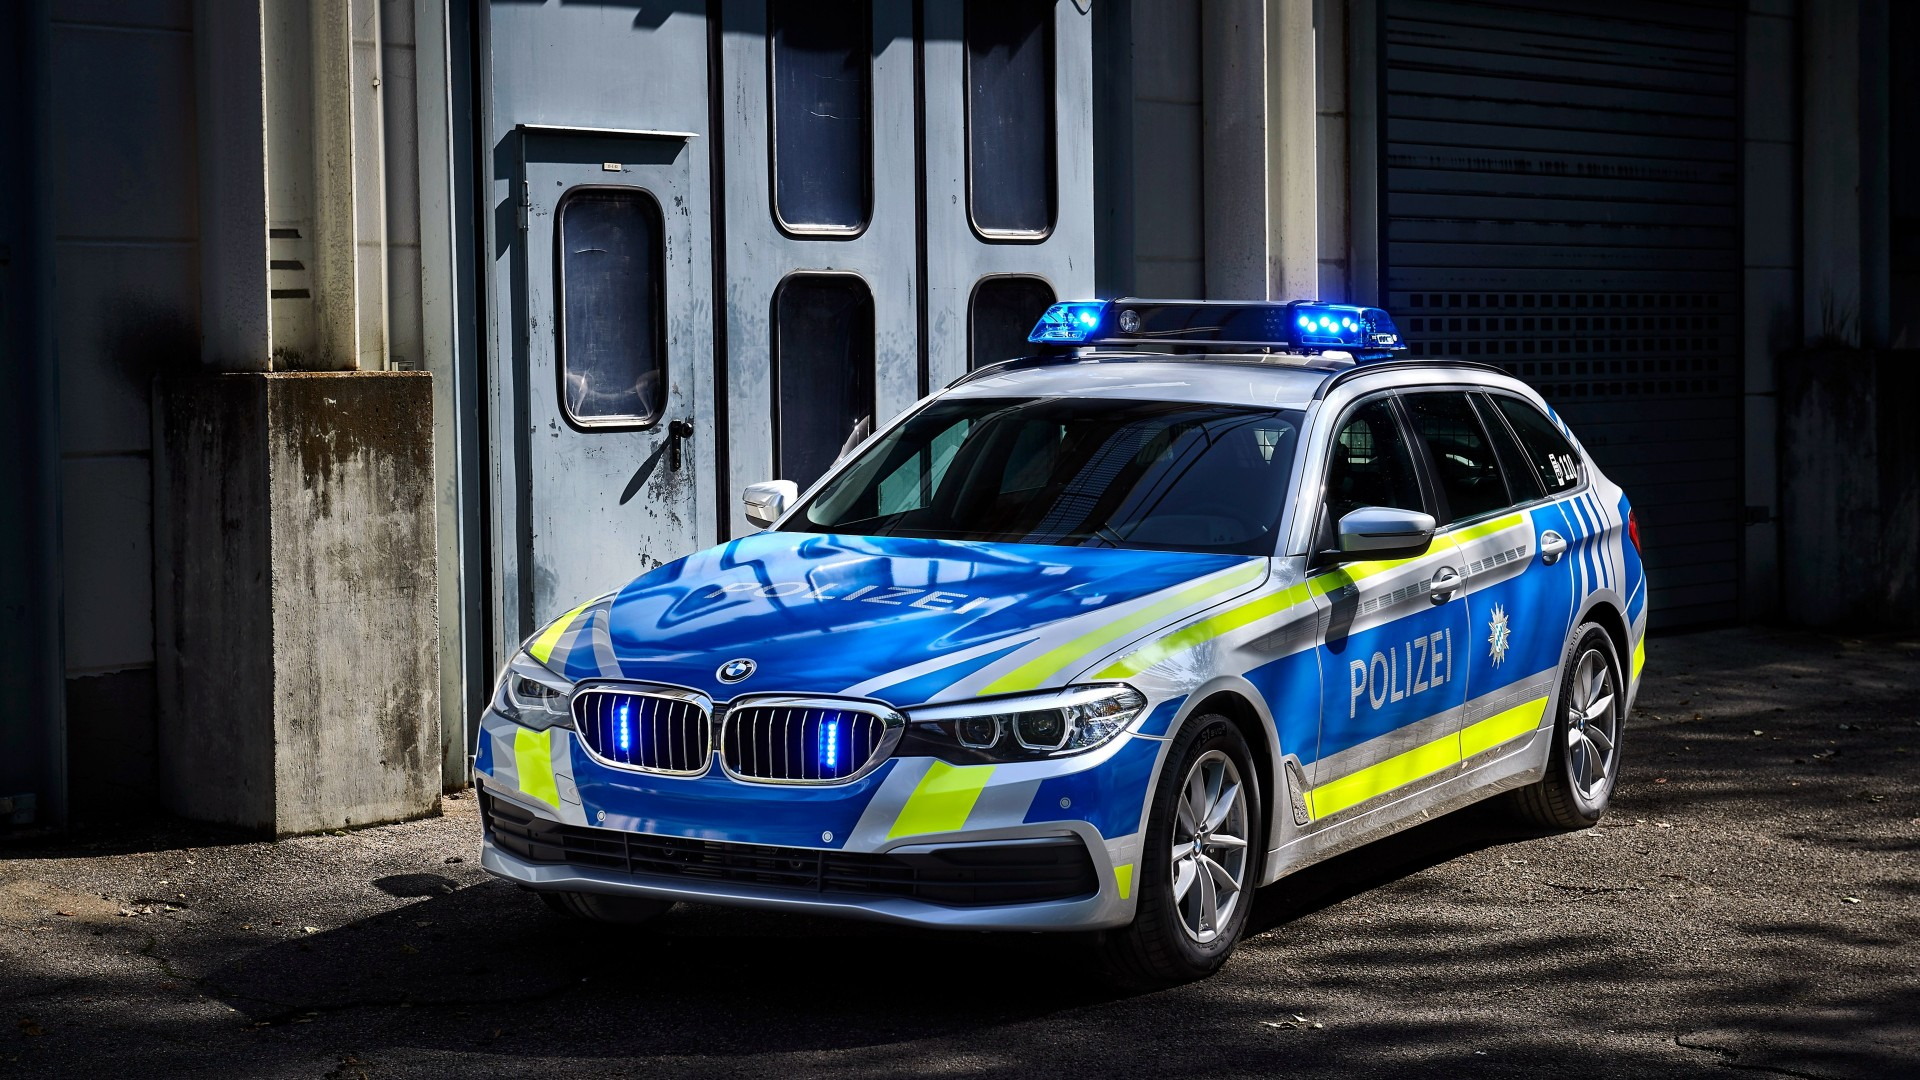 Wallpaper Bmw 530d Xdrive Police Cars 2017 4k Cars